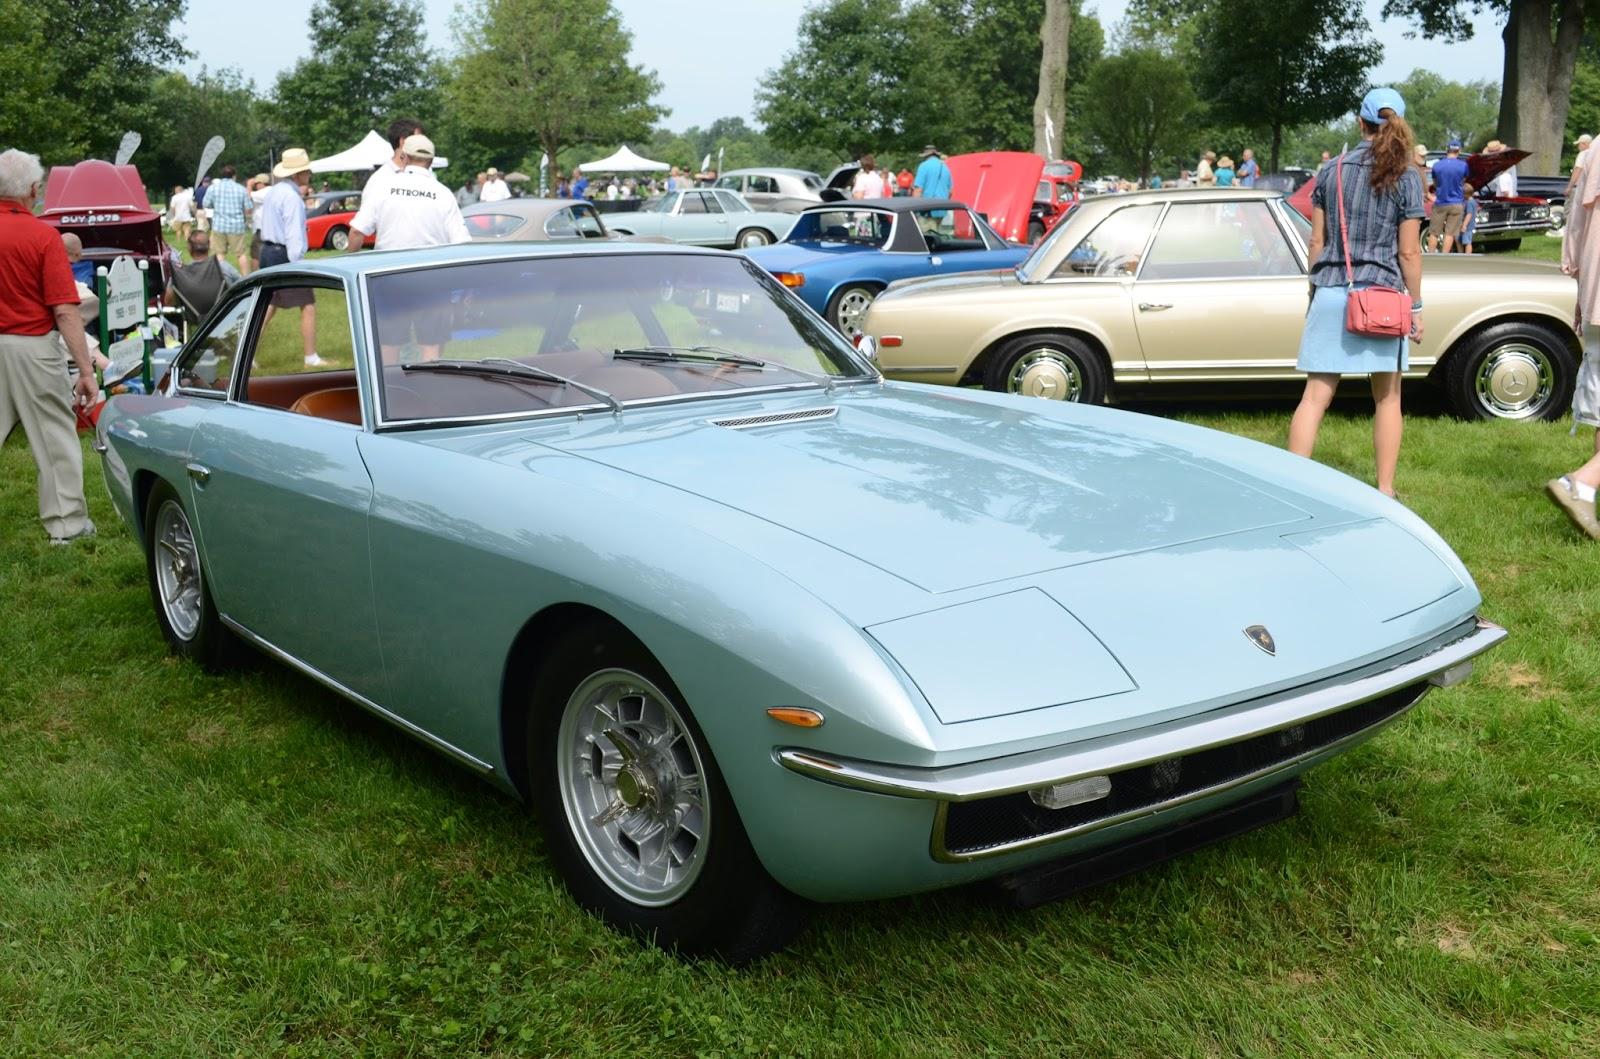 Turnerbudds Car Blog: Sports Contemporary Cars at Keeneland